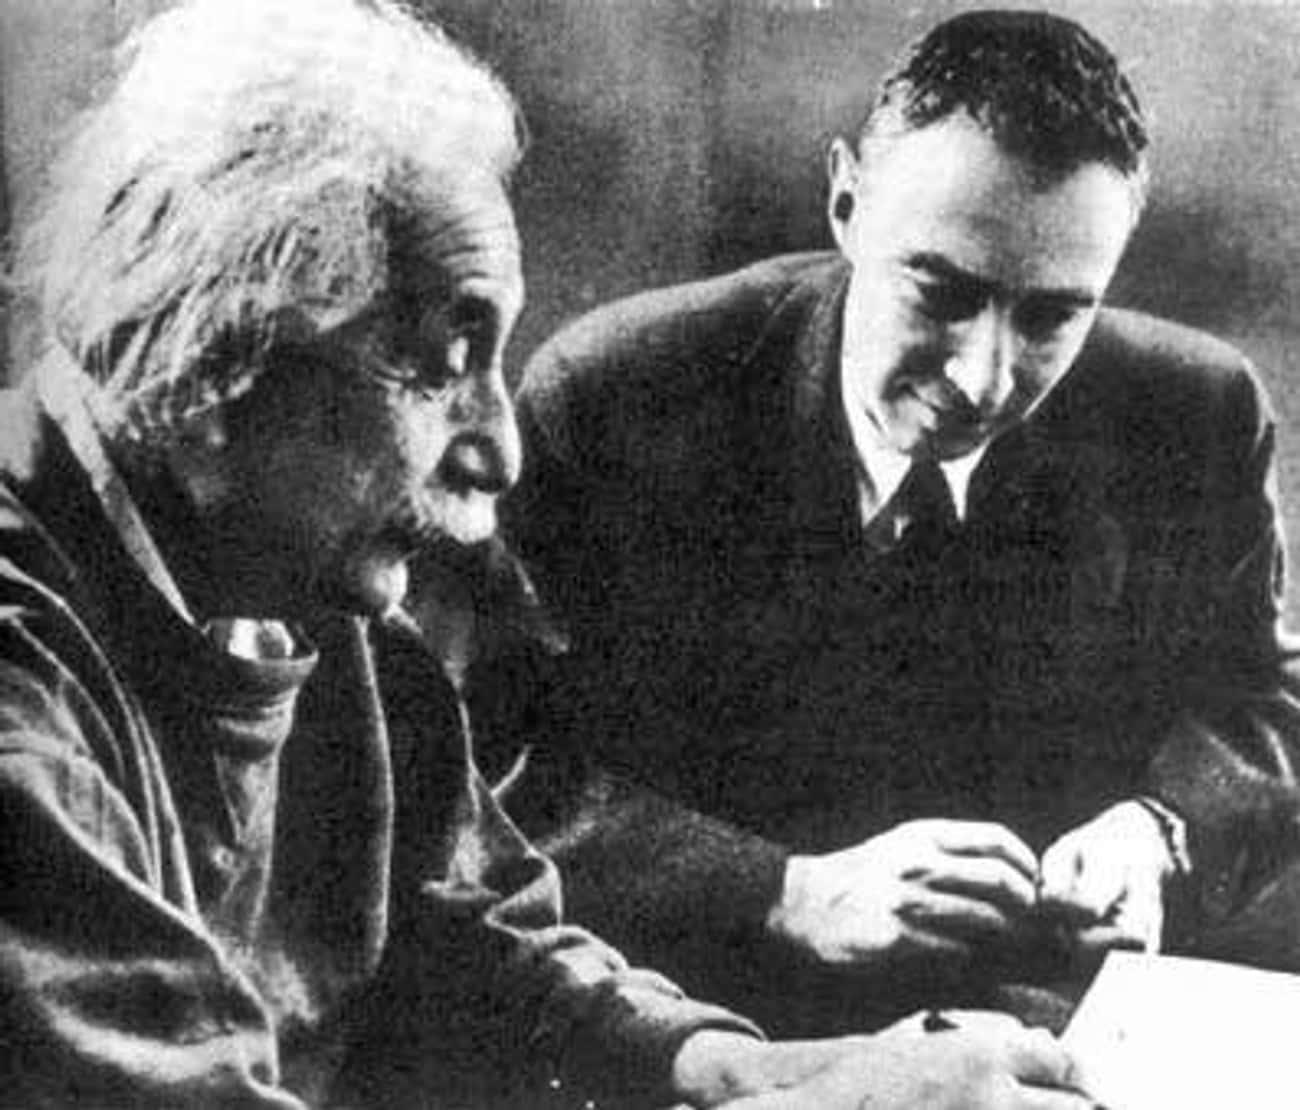 Albert Einstein Married Mileva Marić, But He Was Already Married To His Work